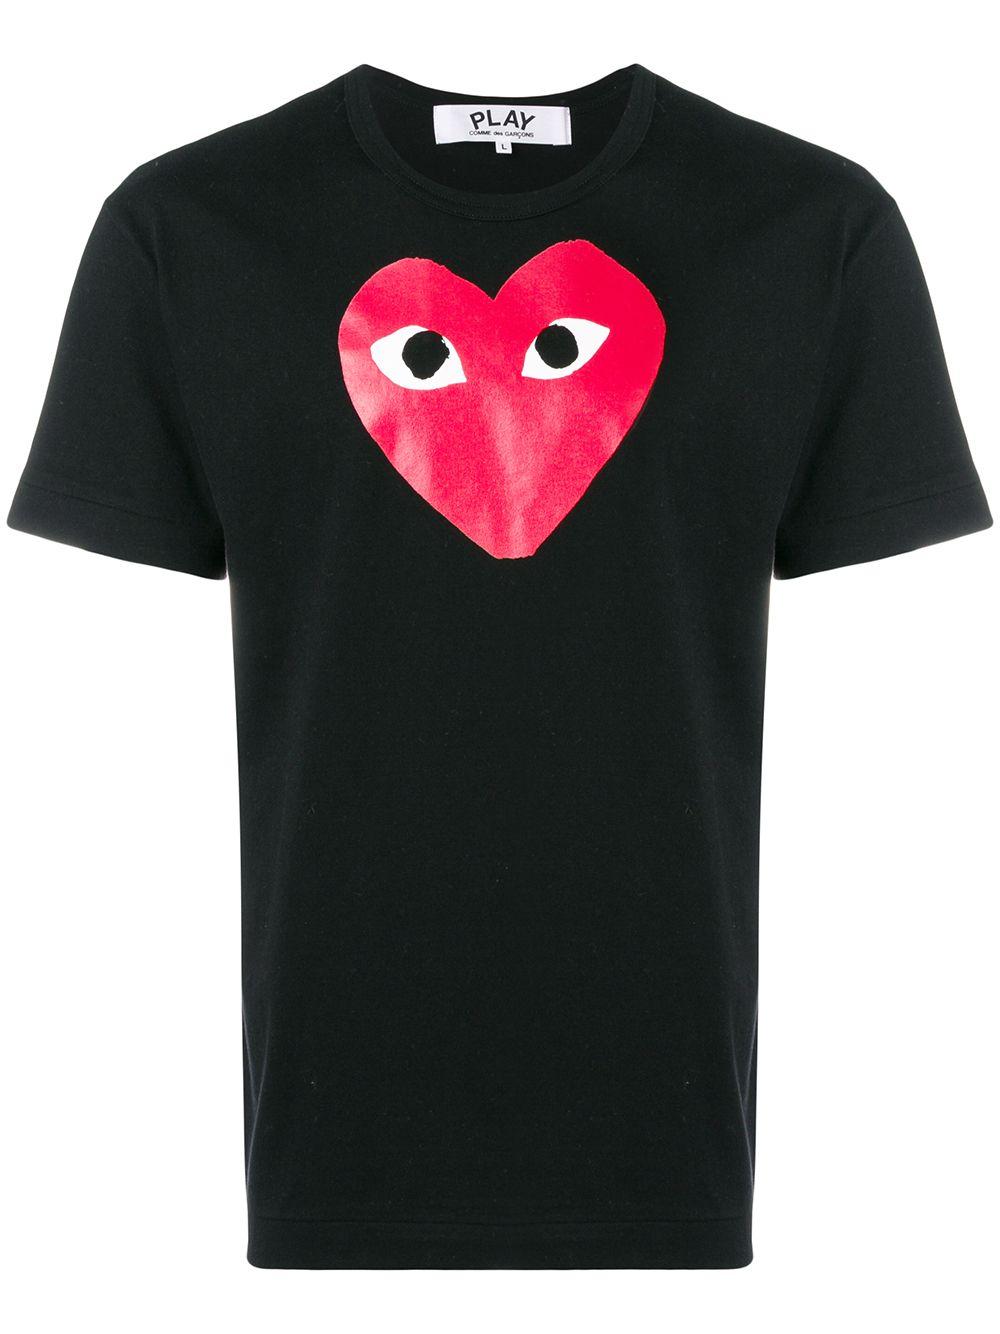 Comme Des Garçons Play play t-shirt unisex COMME DES GARÇONS PLAY | T-shirts | P1T1121